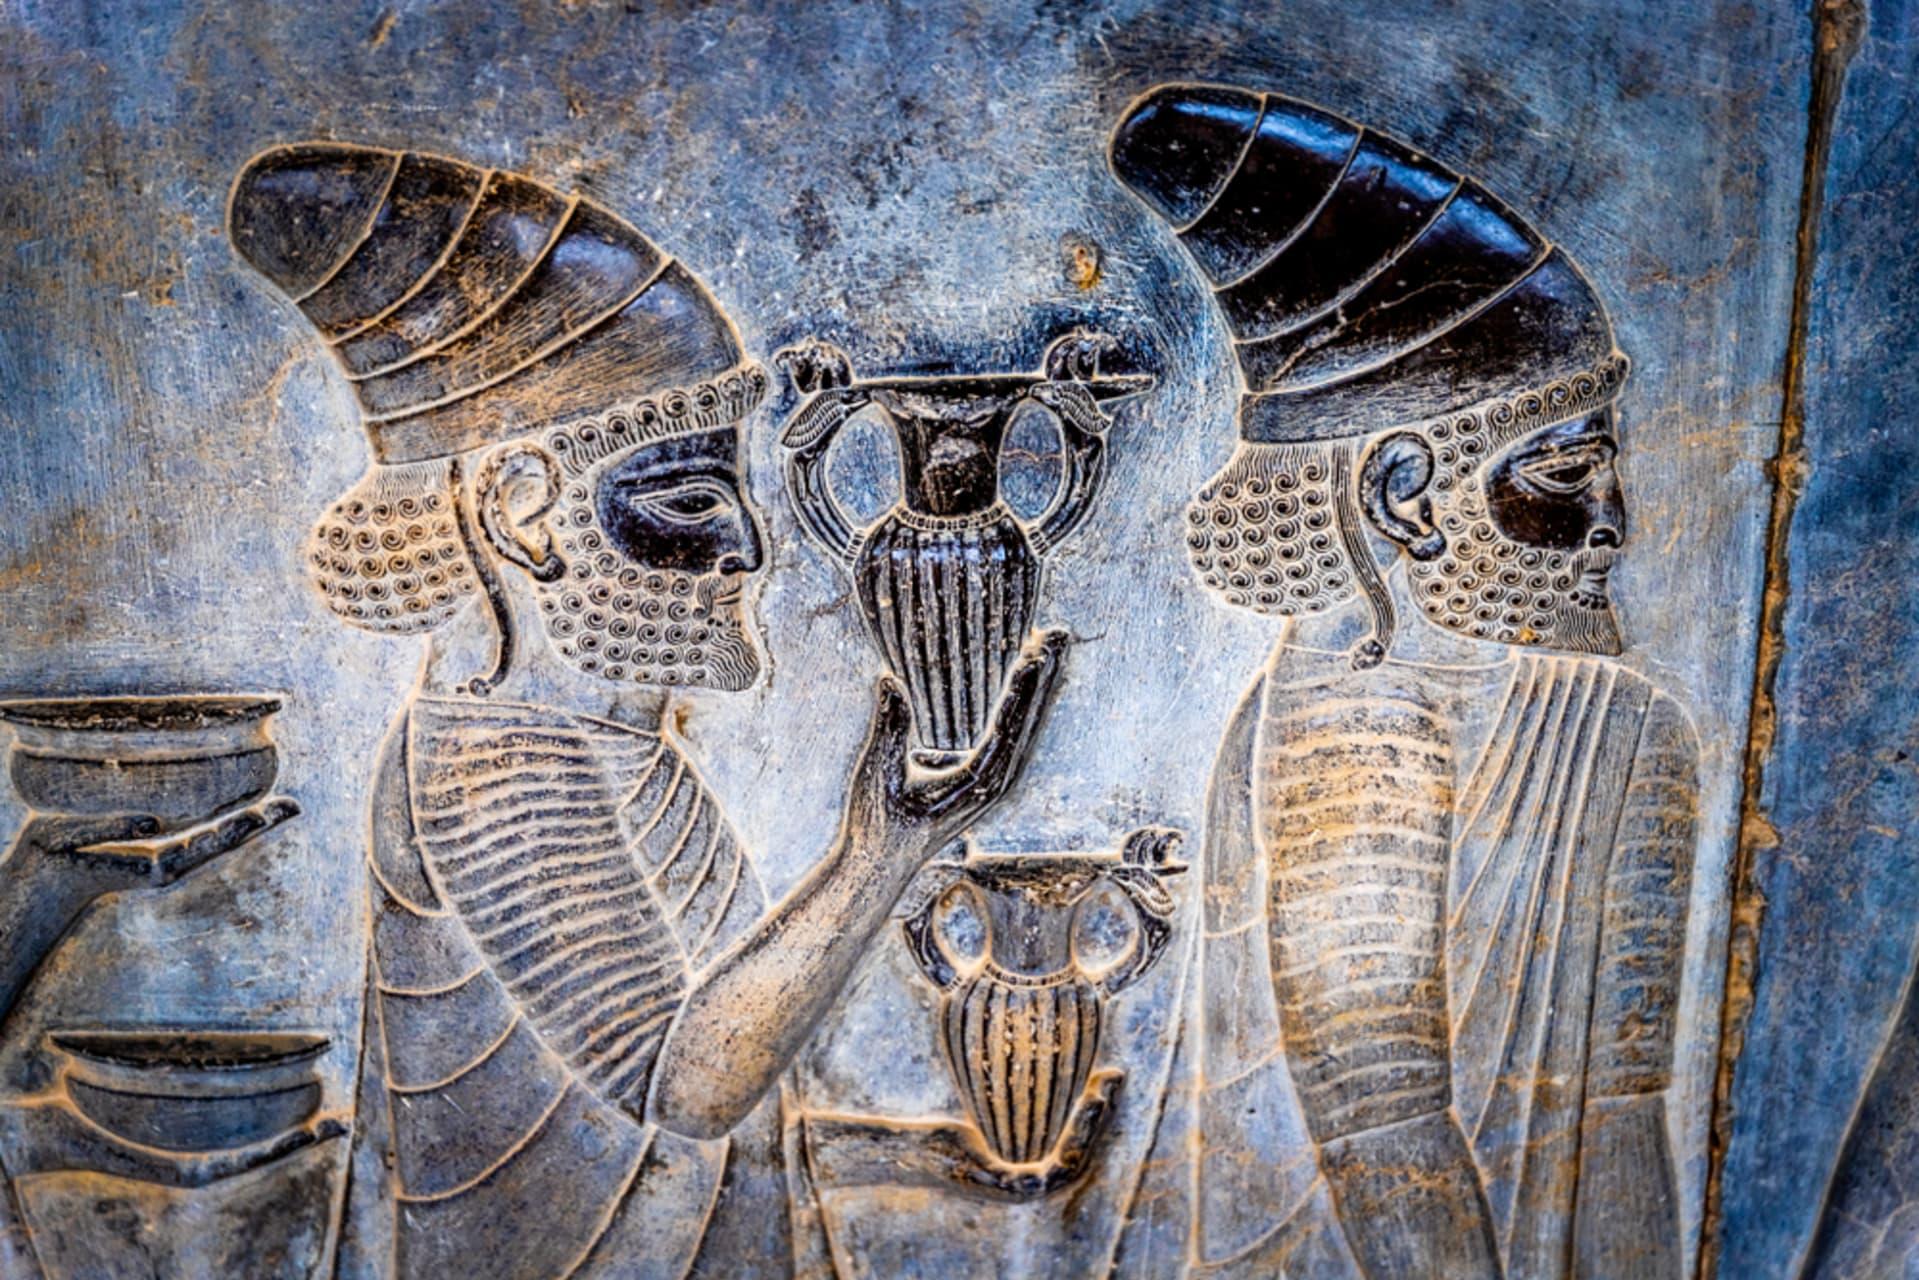 Persepolis and Necropolis - Persepolis, The Ancient Persian Empire: Part I